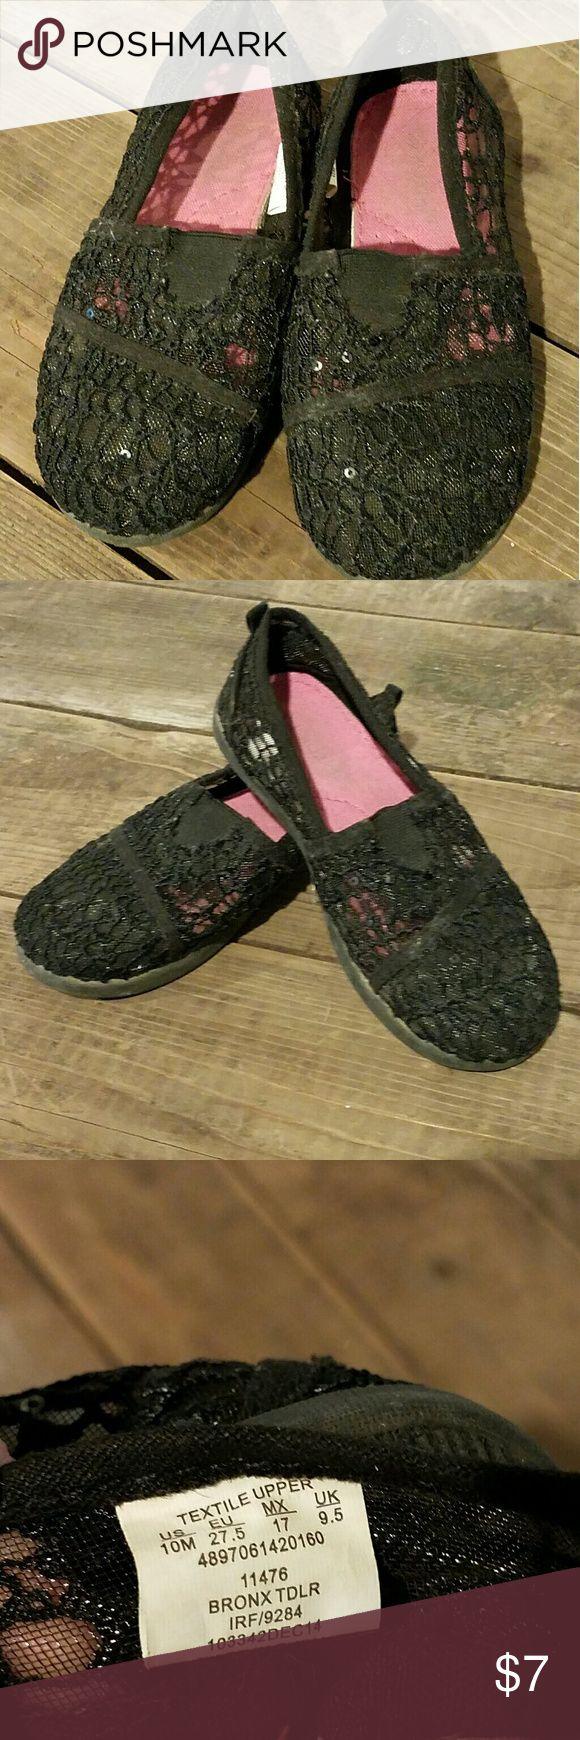 Joe Boxer Slip on Shoes Black Lace Girls Joe Boxer Slip on Shoes In good used condition Joe Boxer Shoes Moccasins